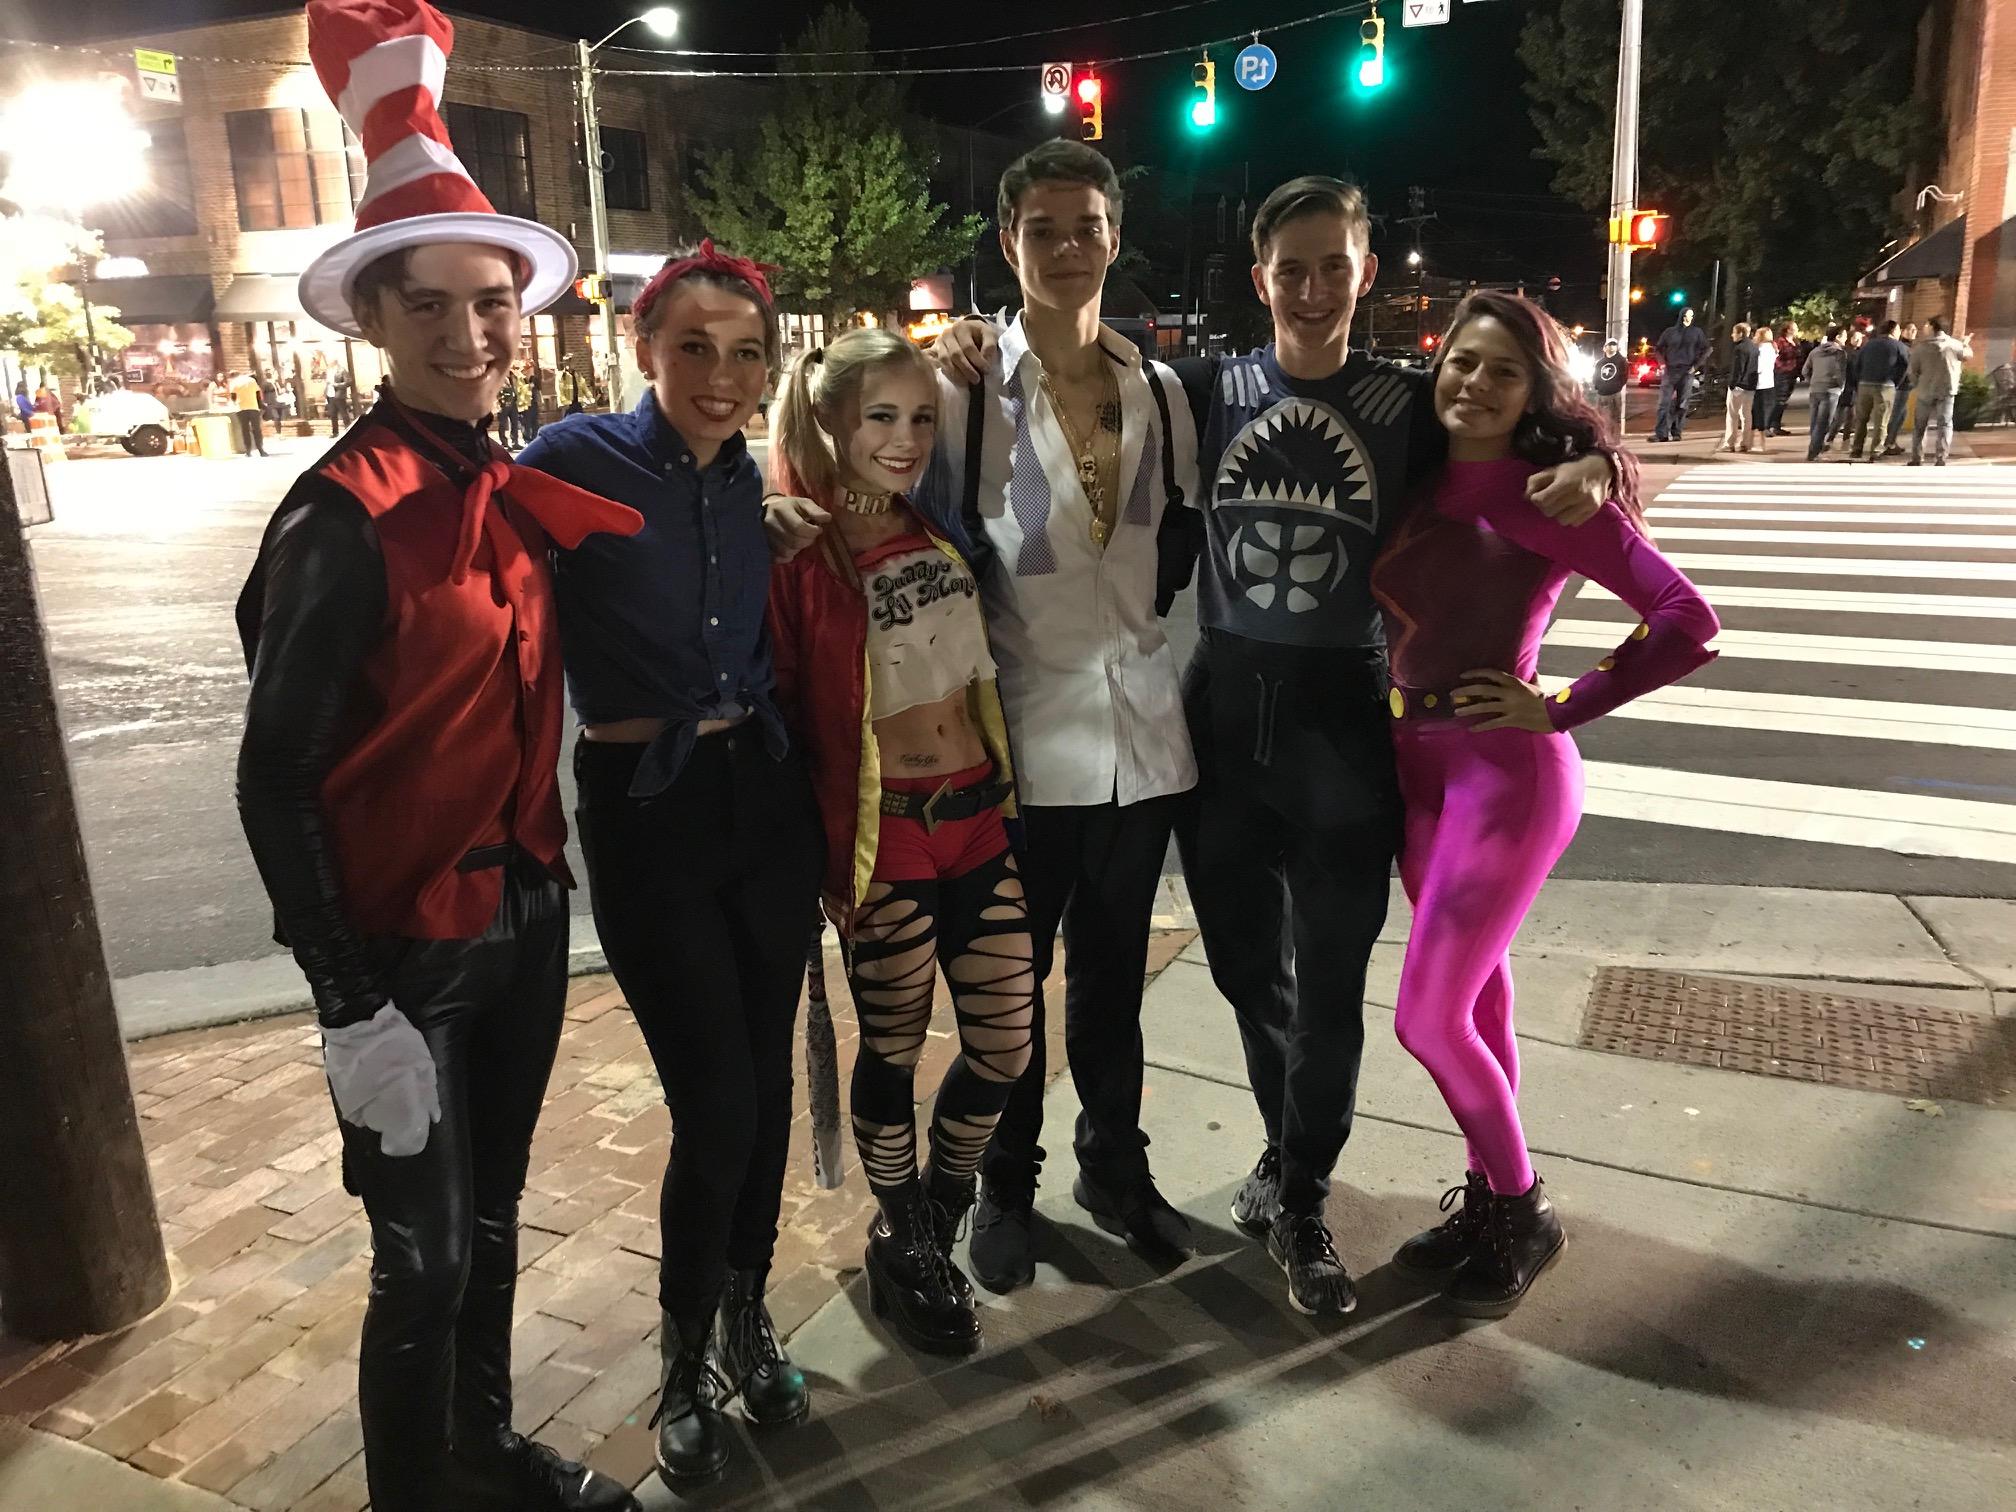 <div class='meta'><div class='origin-logo' data-origin='WTVD'></div><span class='caption-text' data-credit=''>Chapel Hill celebrates Halloween on Franklin Street</span></div>